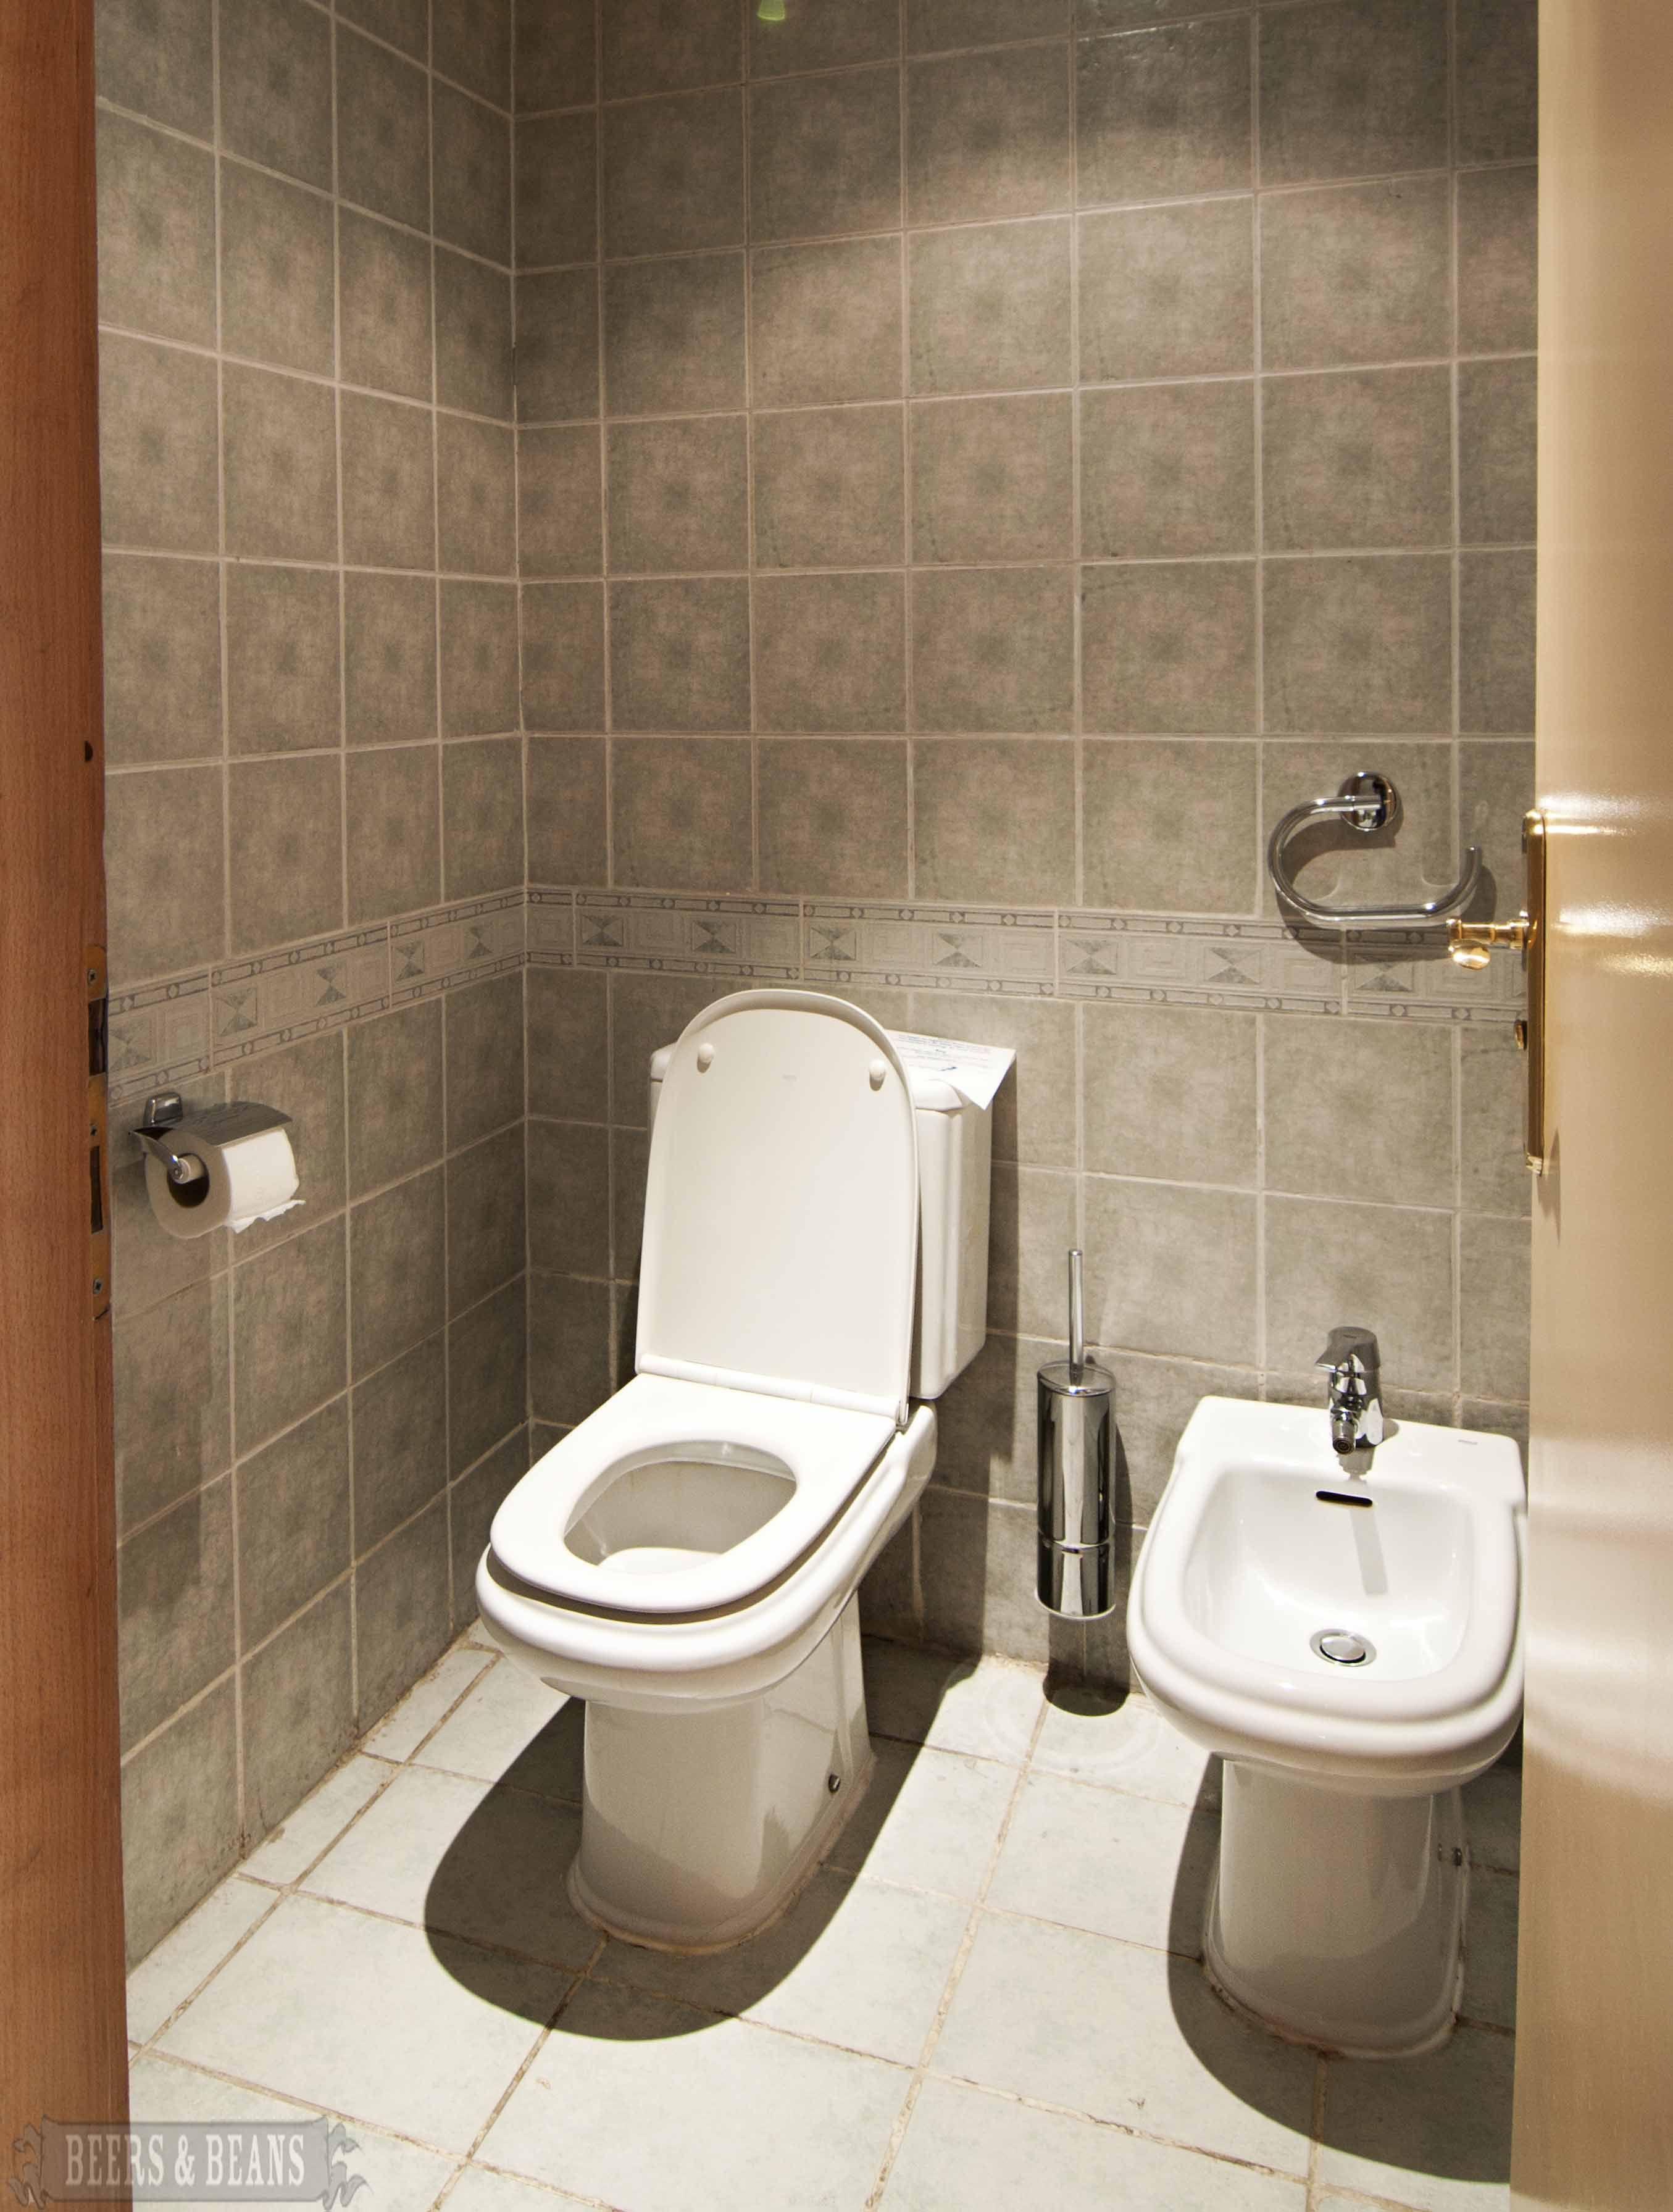 Bidet Huh What Is Good For Bidet Bidet Bathroom Small Space